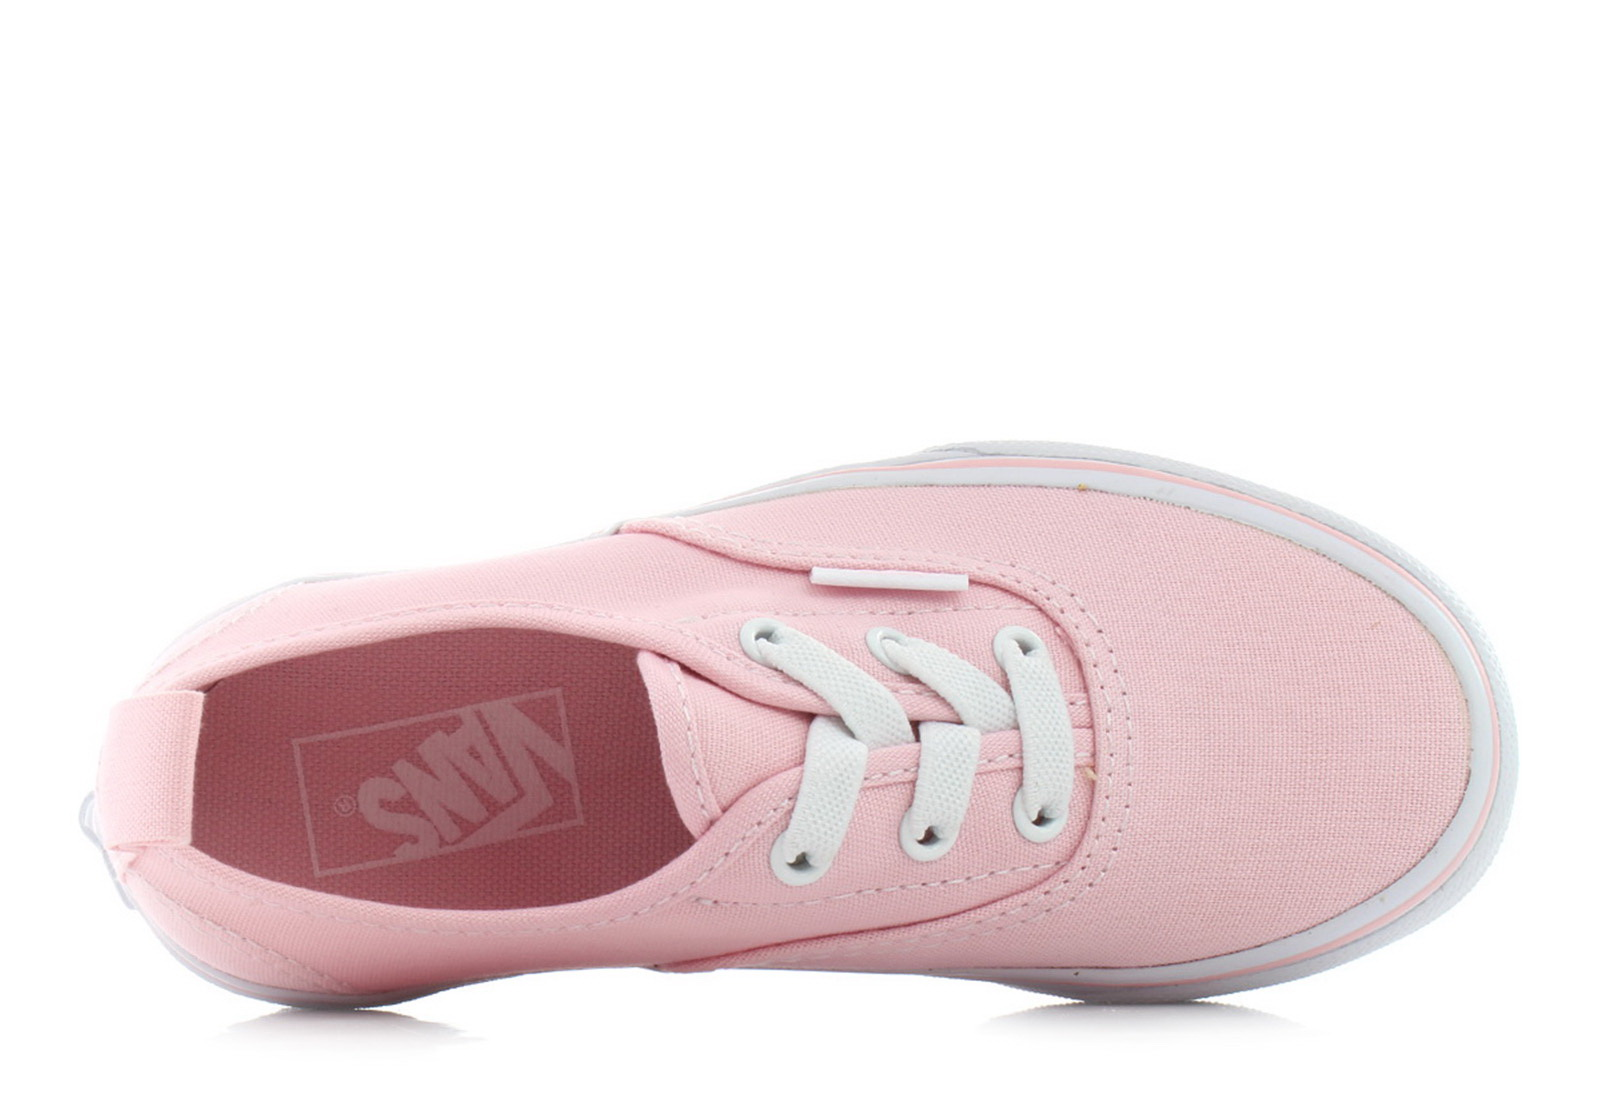 40c156da3961 Vans Cipő - Td Authentic Elastic Lace - VA38E8Q1C - Office Shoes ...